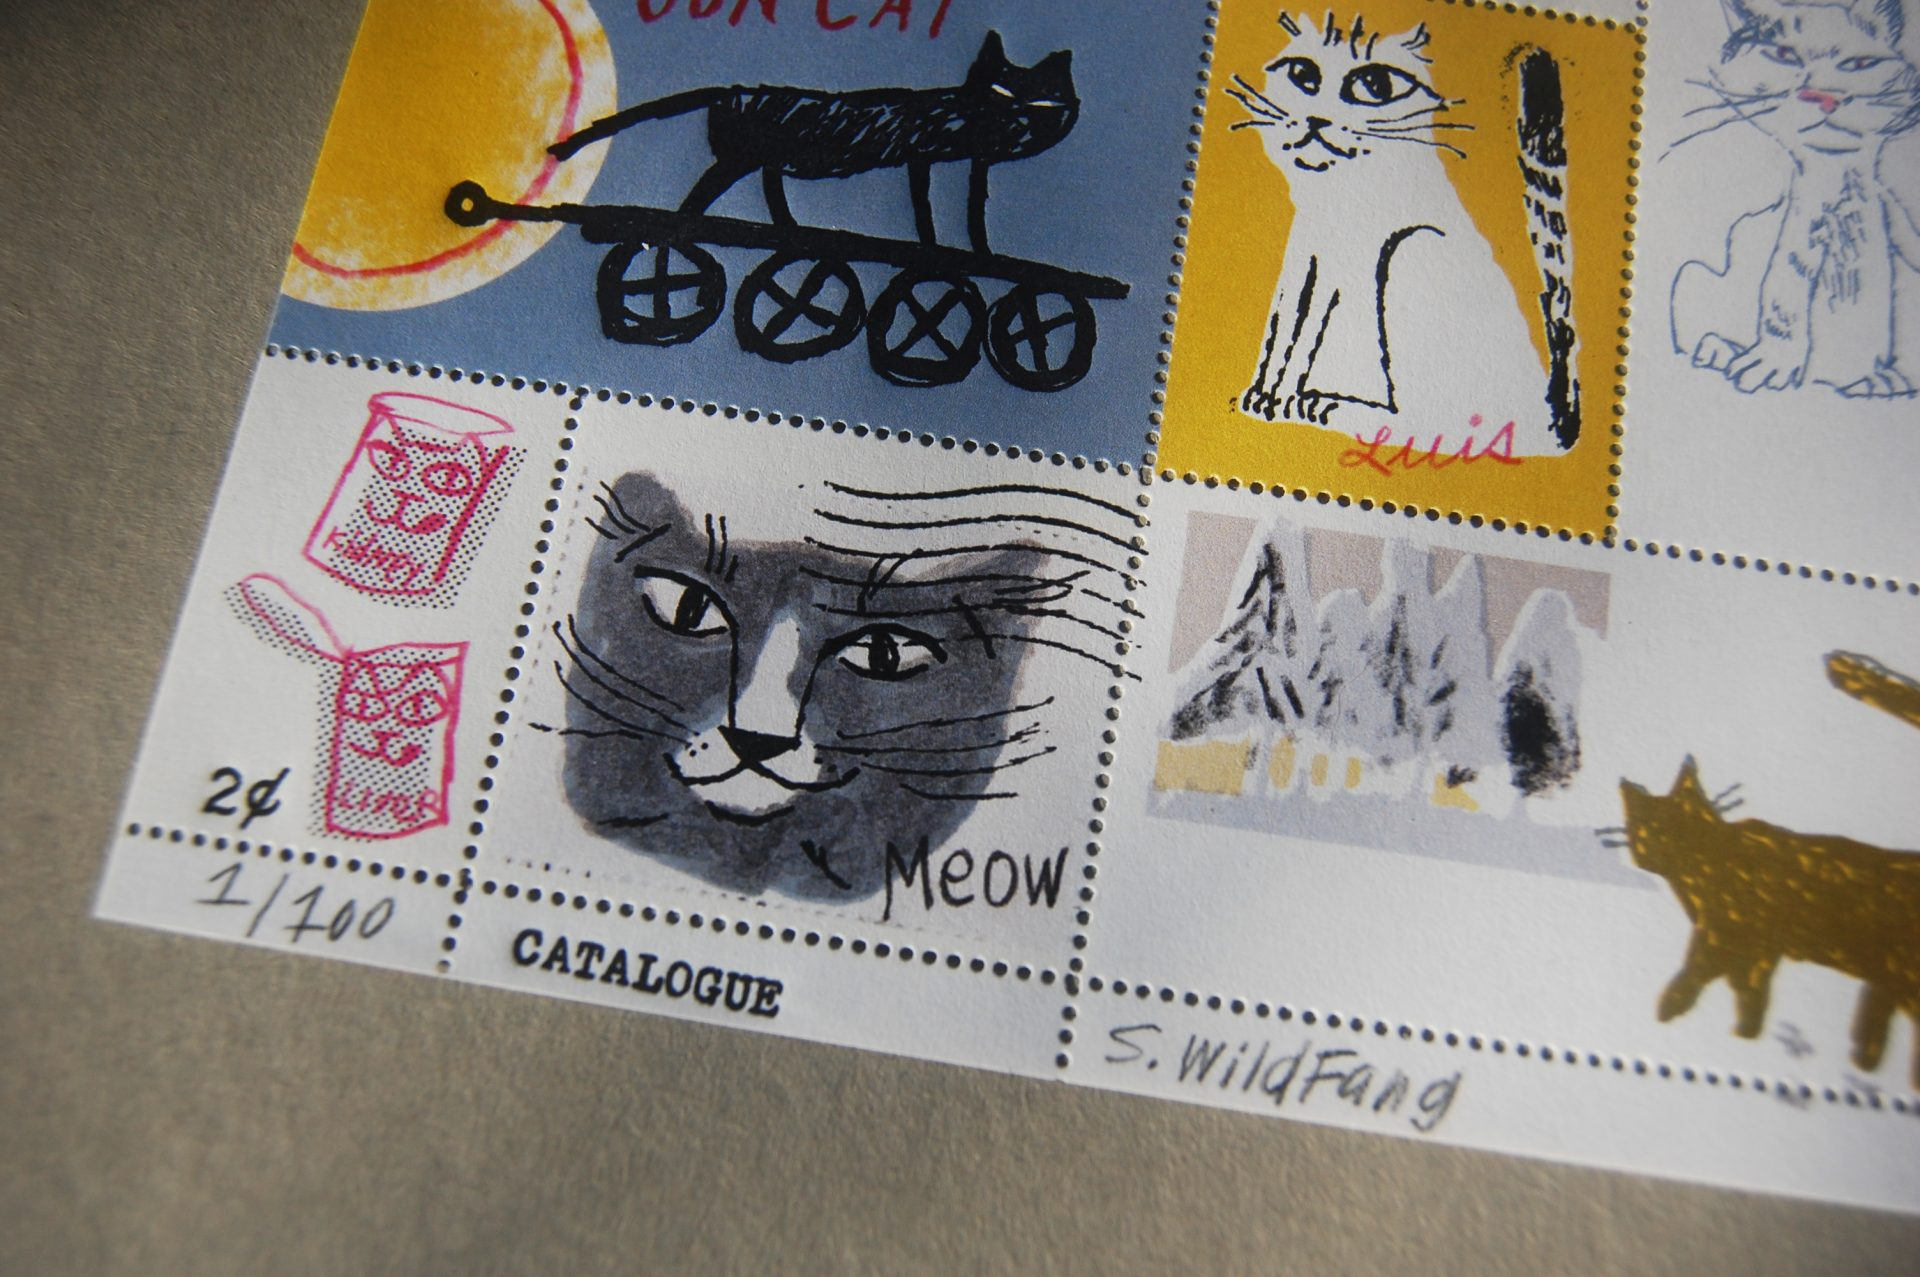 Sarah Wildfang artist stamp